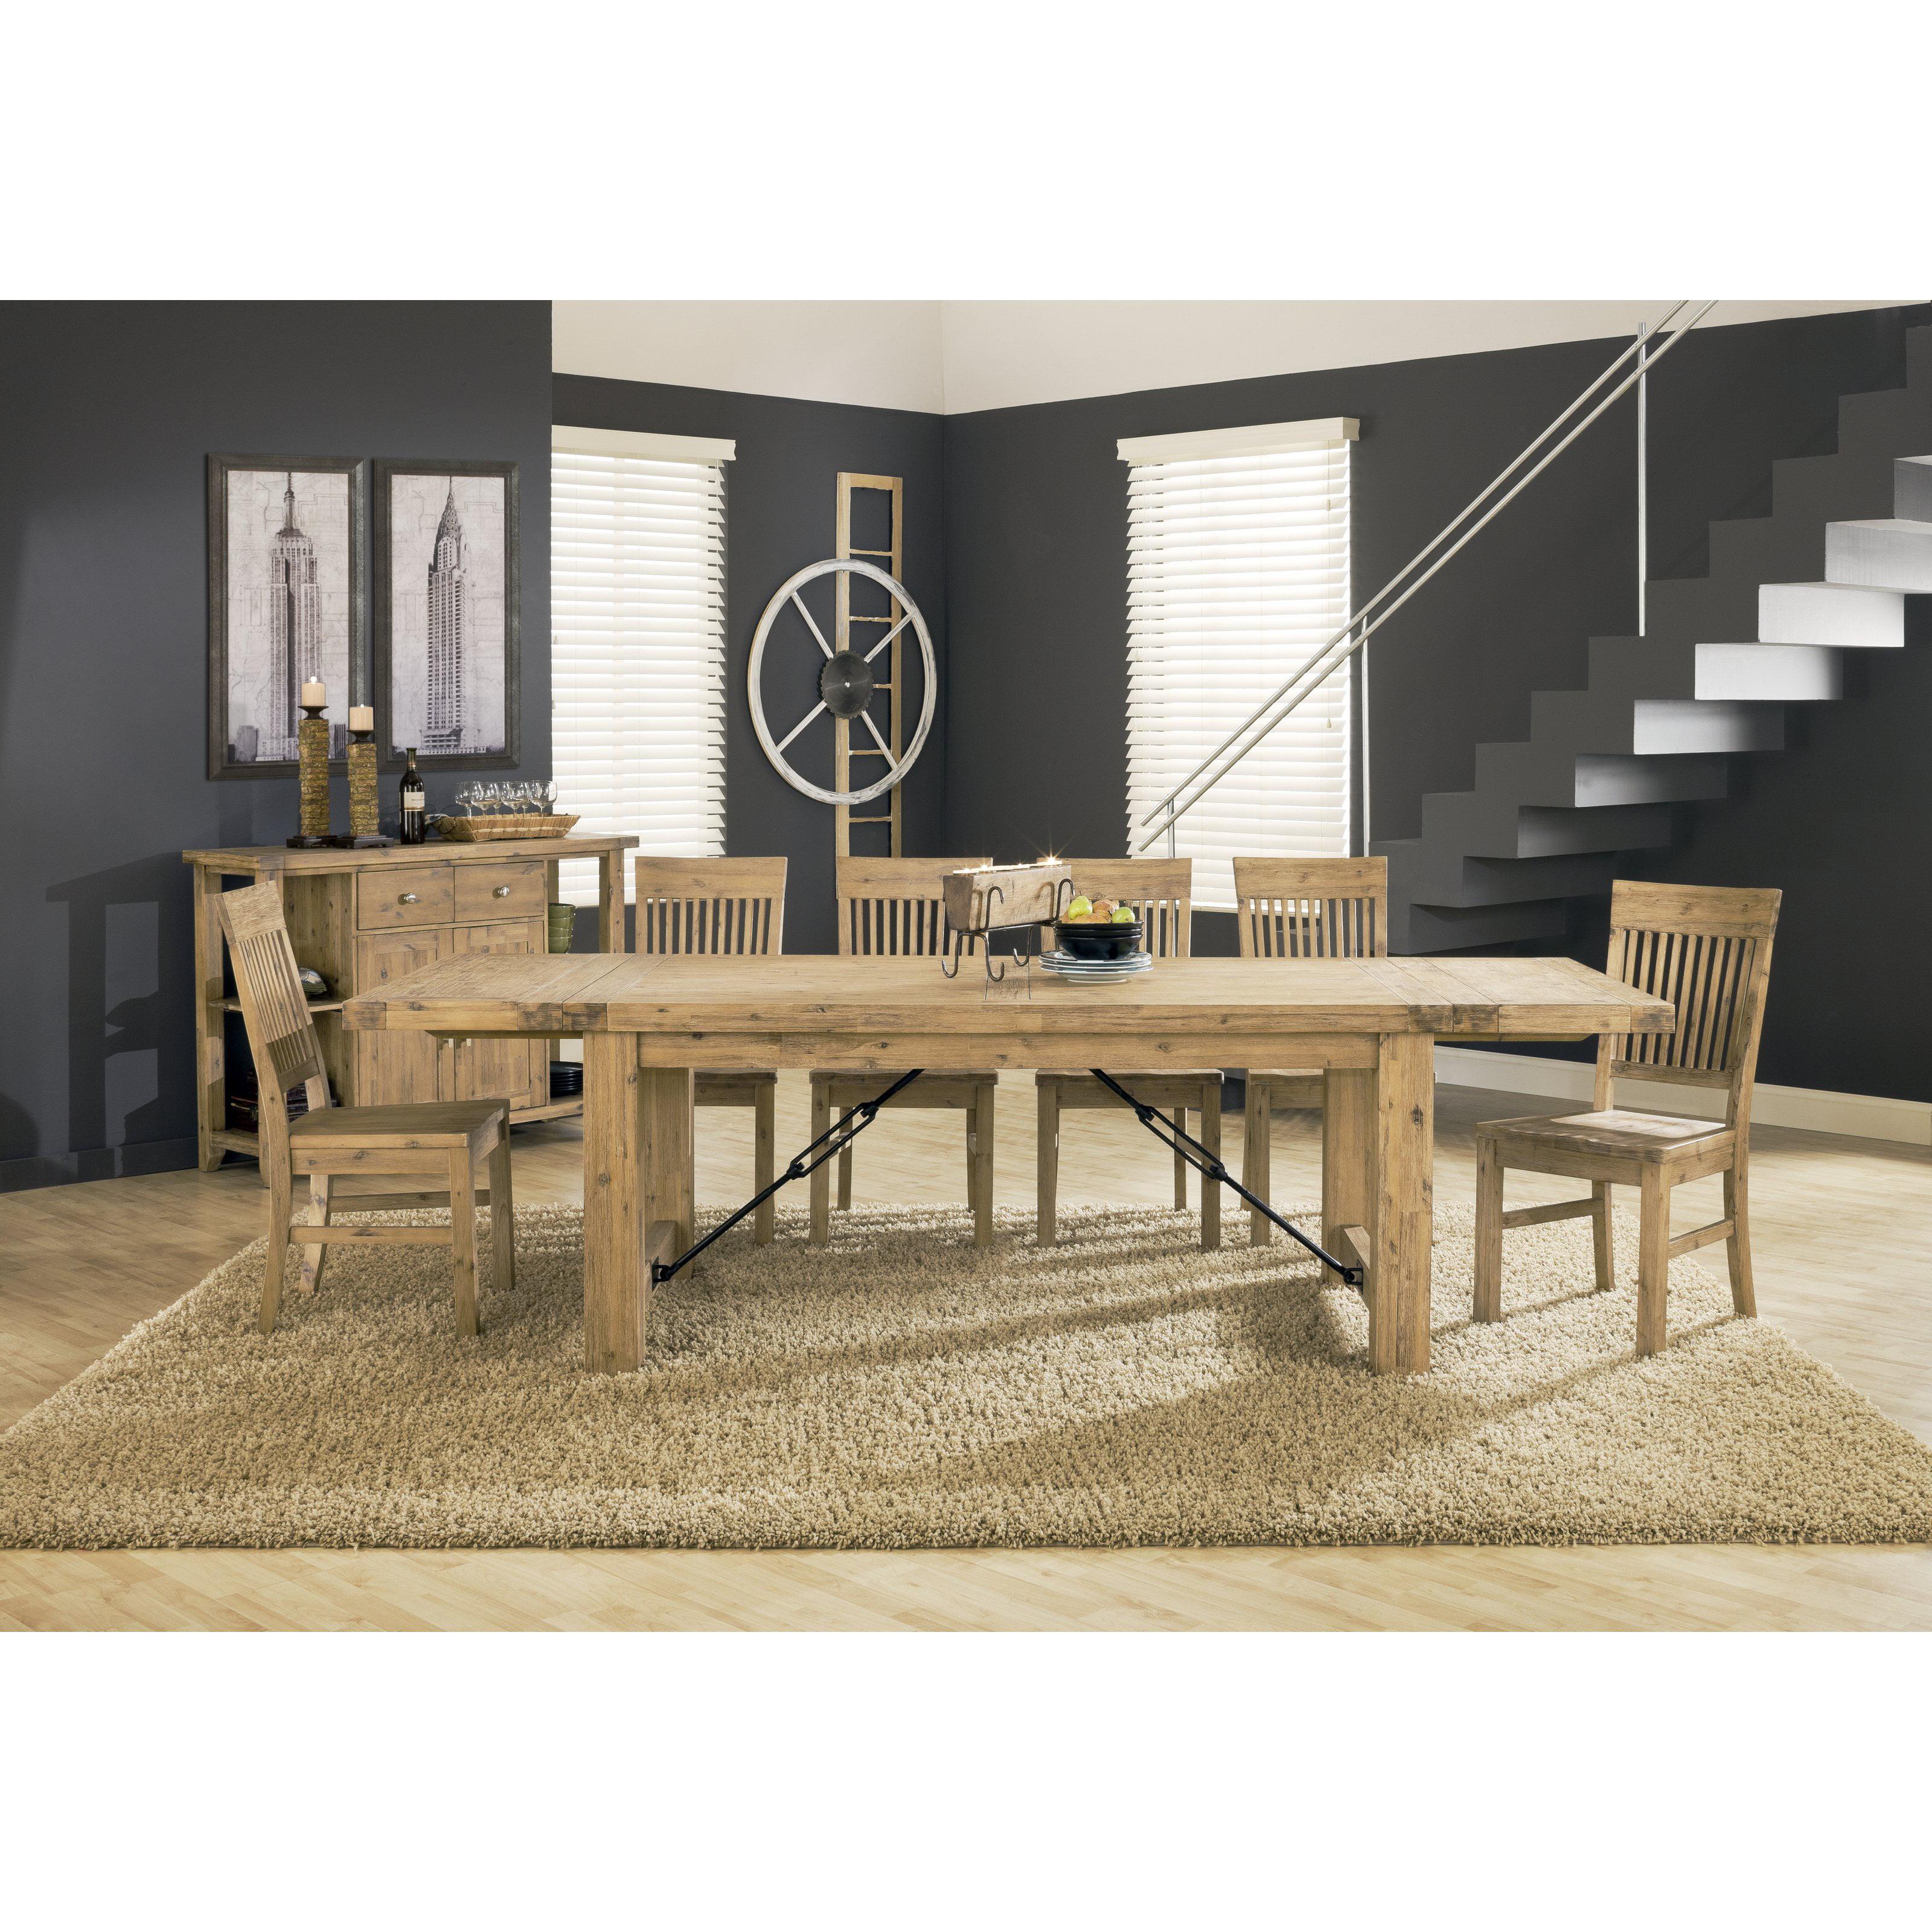 Modus Autumn 11 Piece Dining Table Set by Modus Furniture International